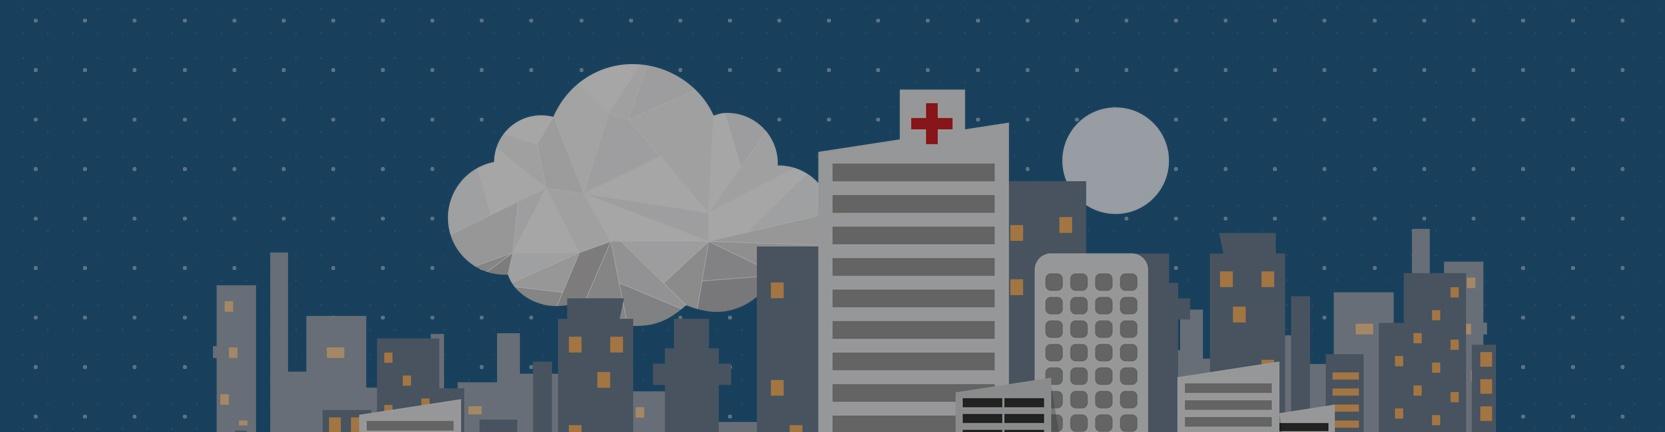 2018 HIPAA-Whitepaper-Banner.jpg